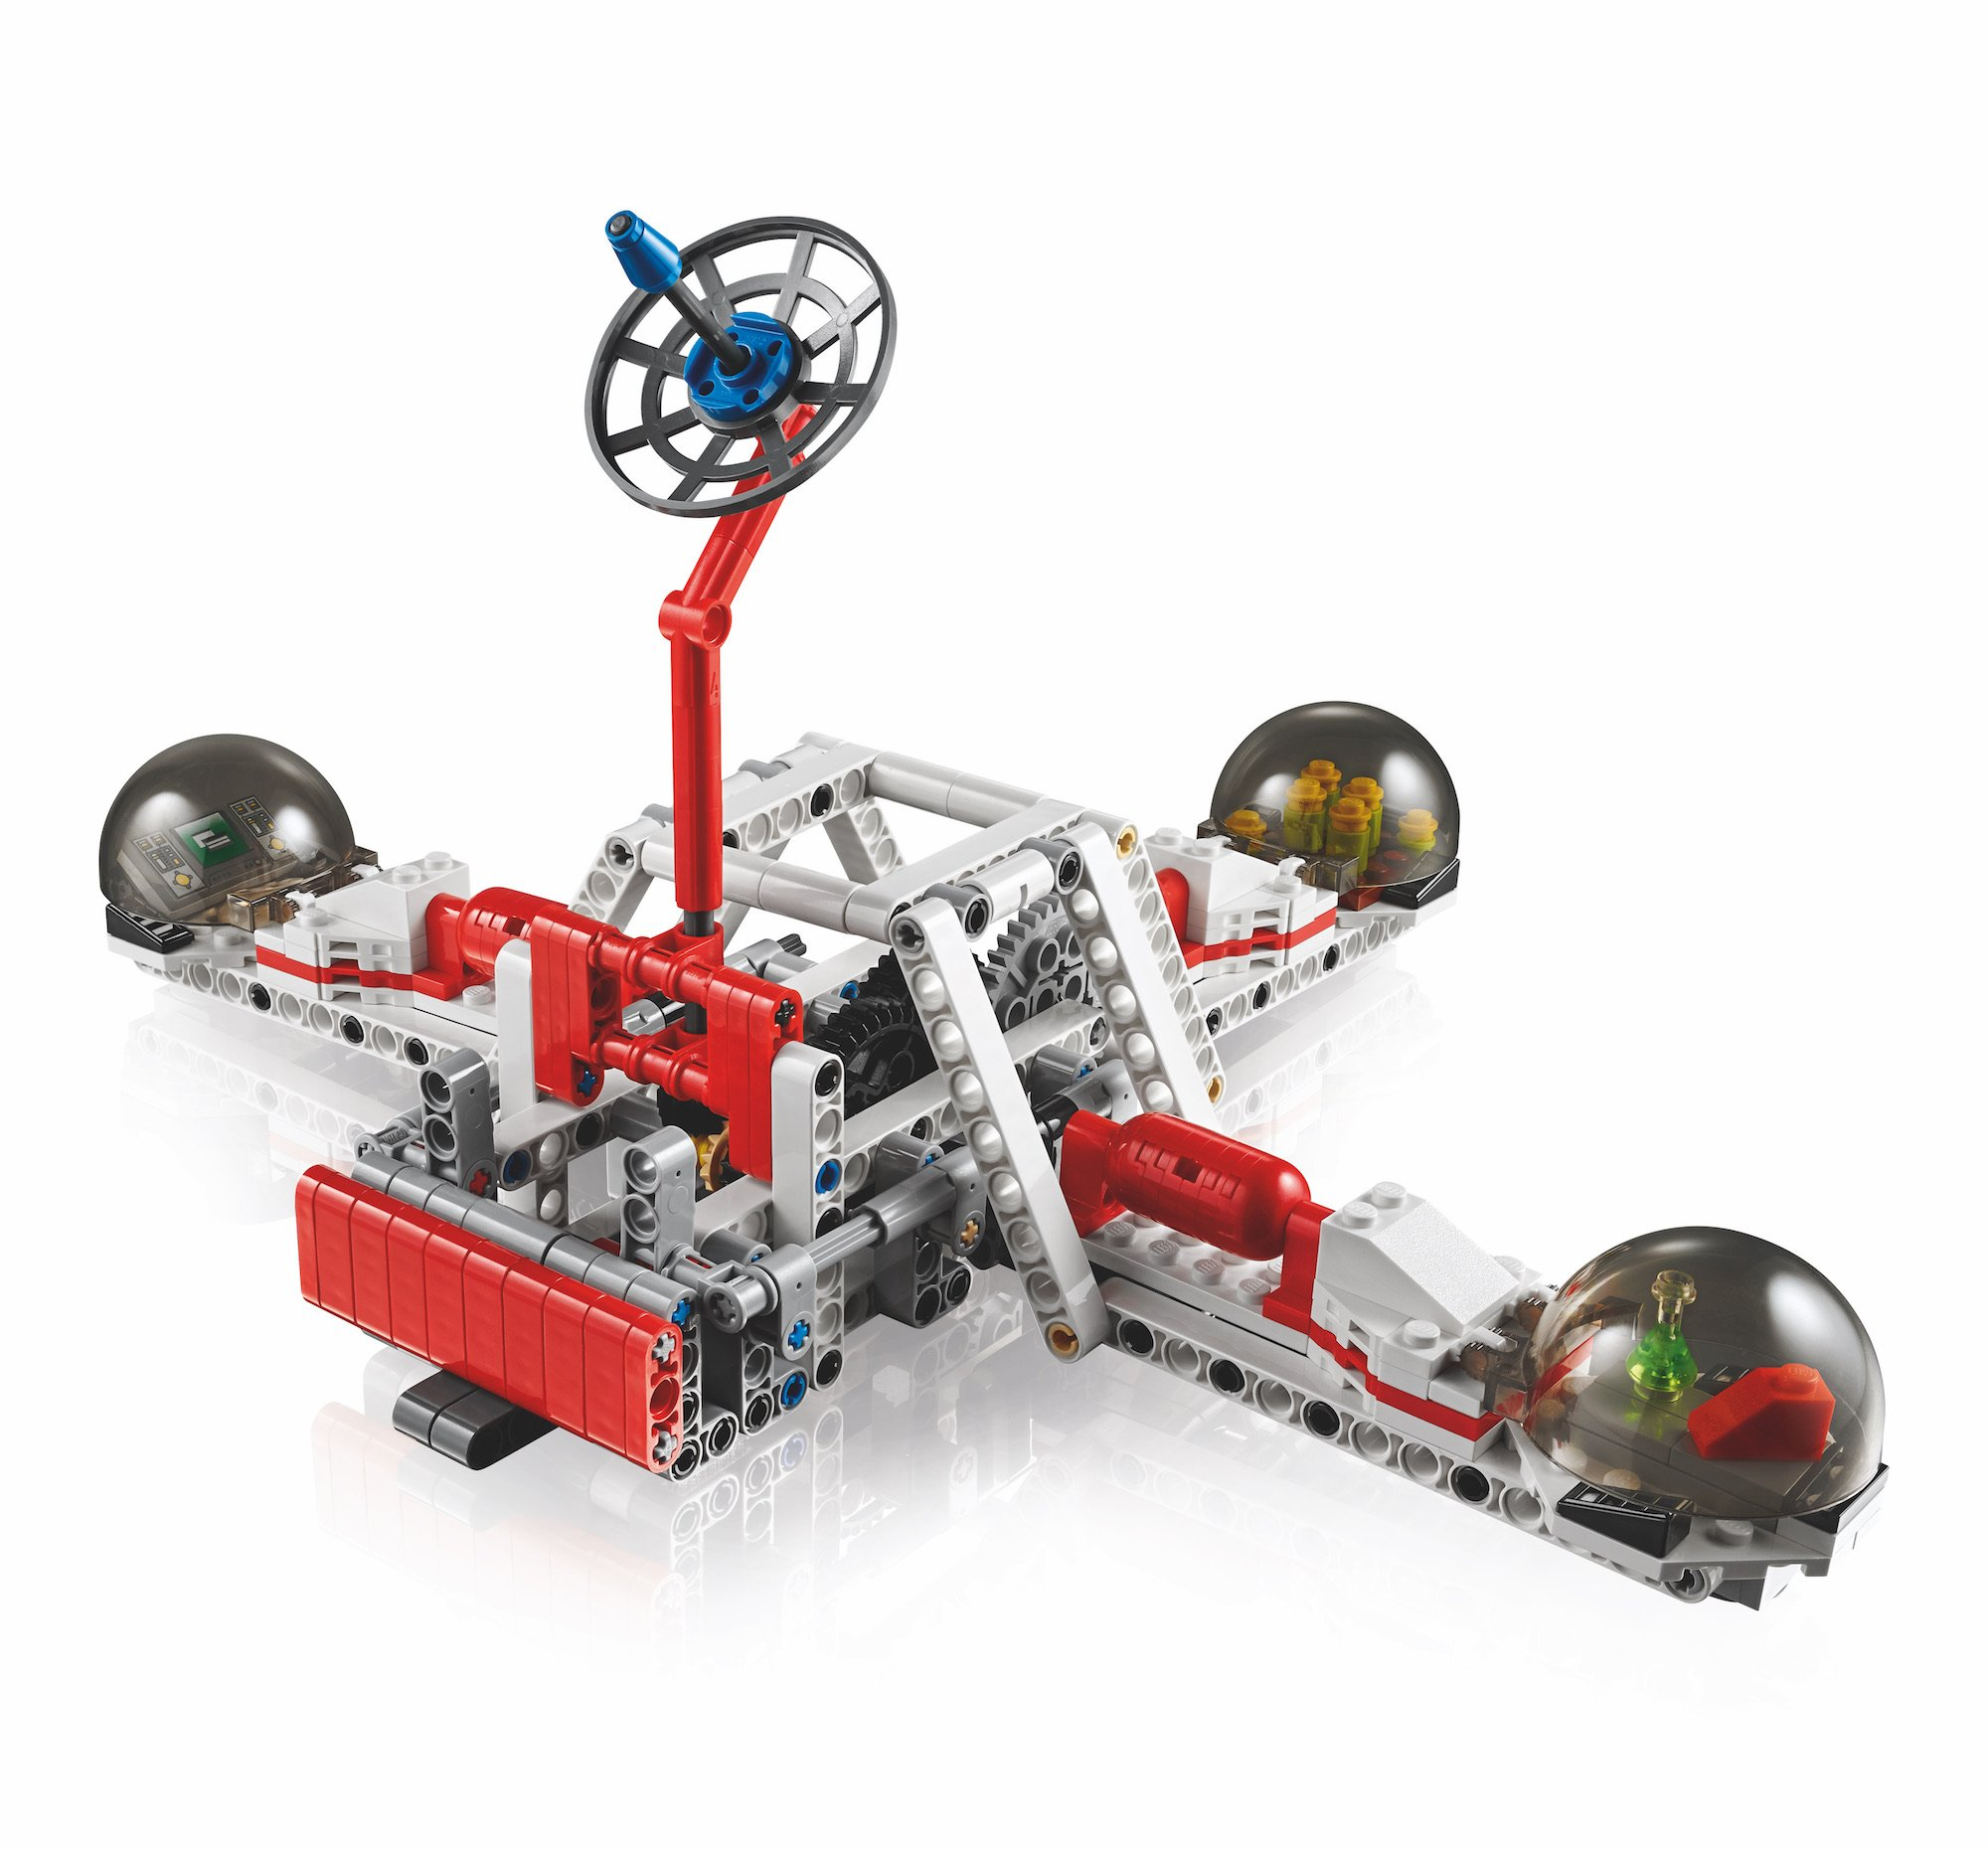 LEGO® MINDSTORMS® Education EV3 Space Challenge Mars outpost open